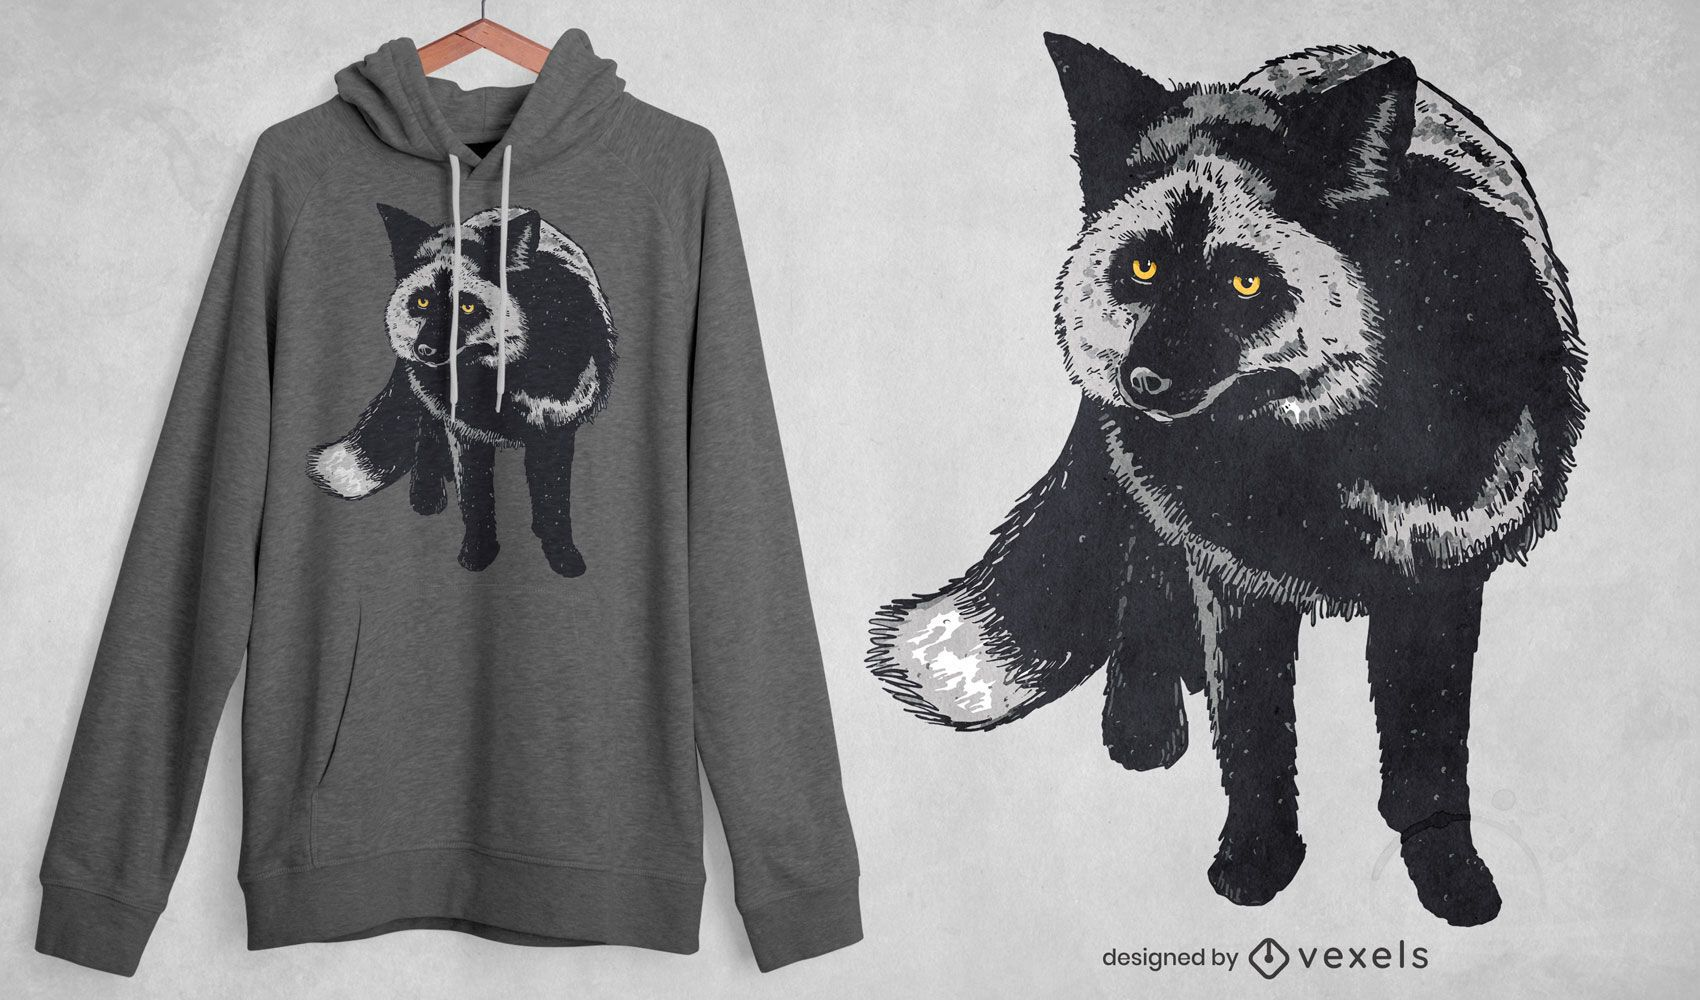 Diseño de camiseta realista de zorro plateado.